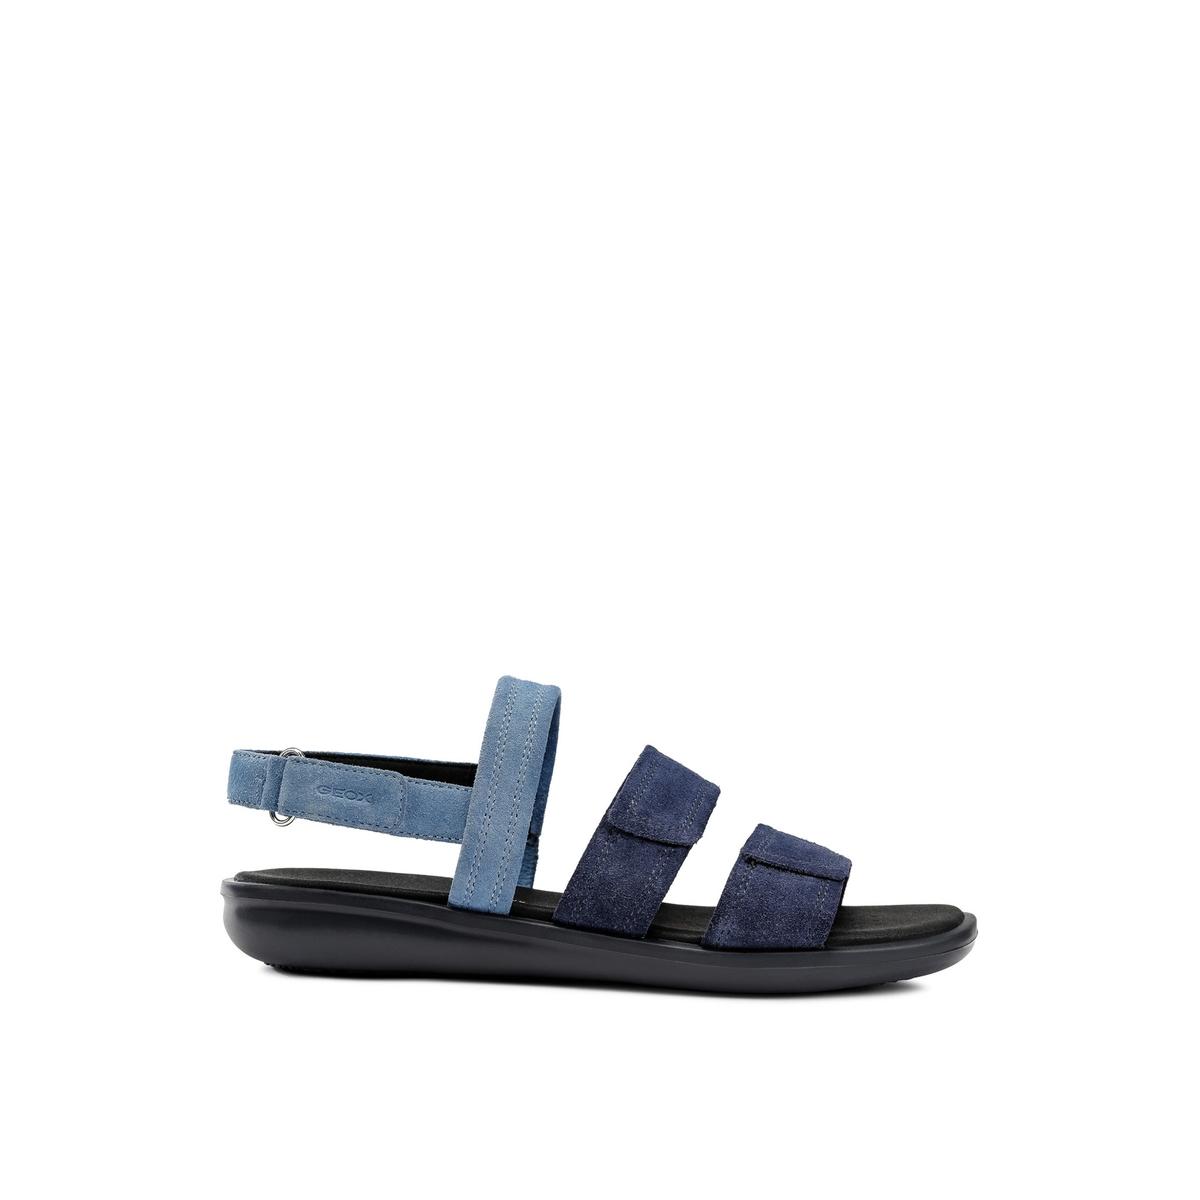 Sandalias transpirables de piel Jearl